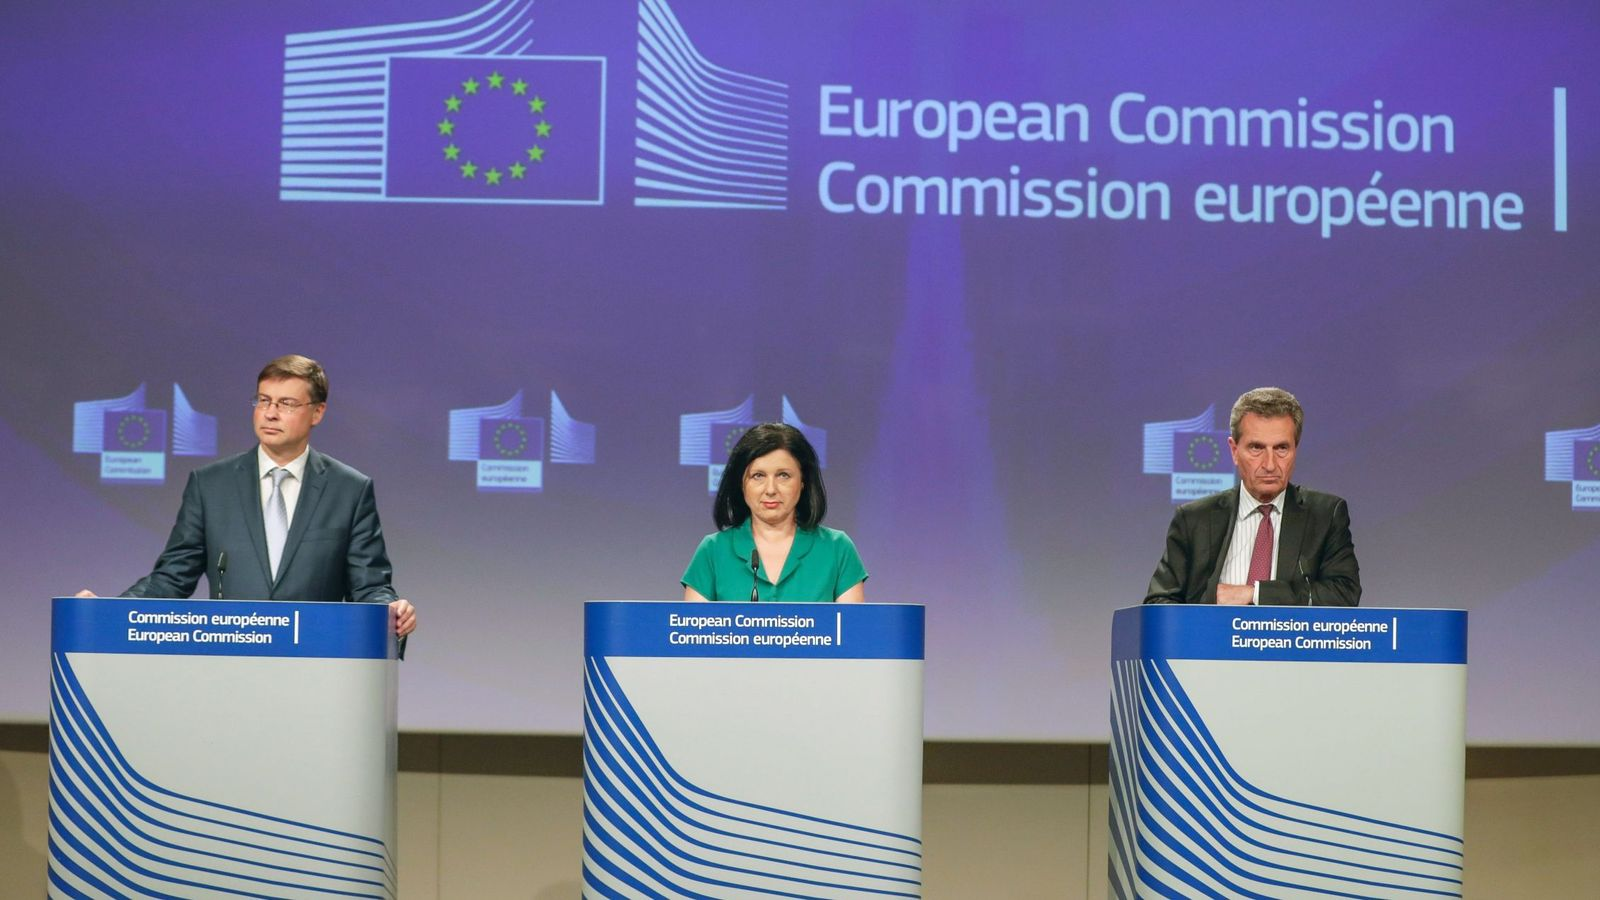 Foto: De izquierda a derecha, Valdis Dombrovskis, Vera Jourova y Günther Oettinger. (Reuters)